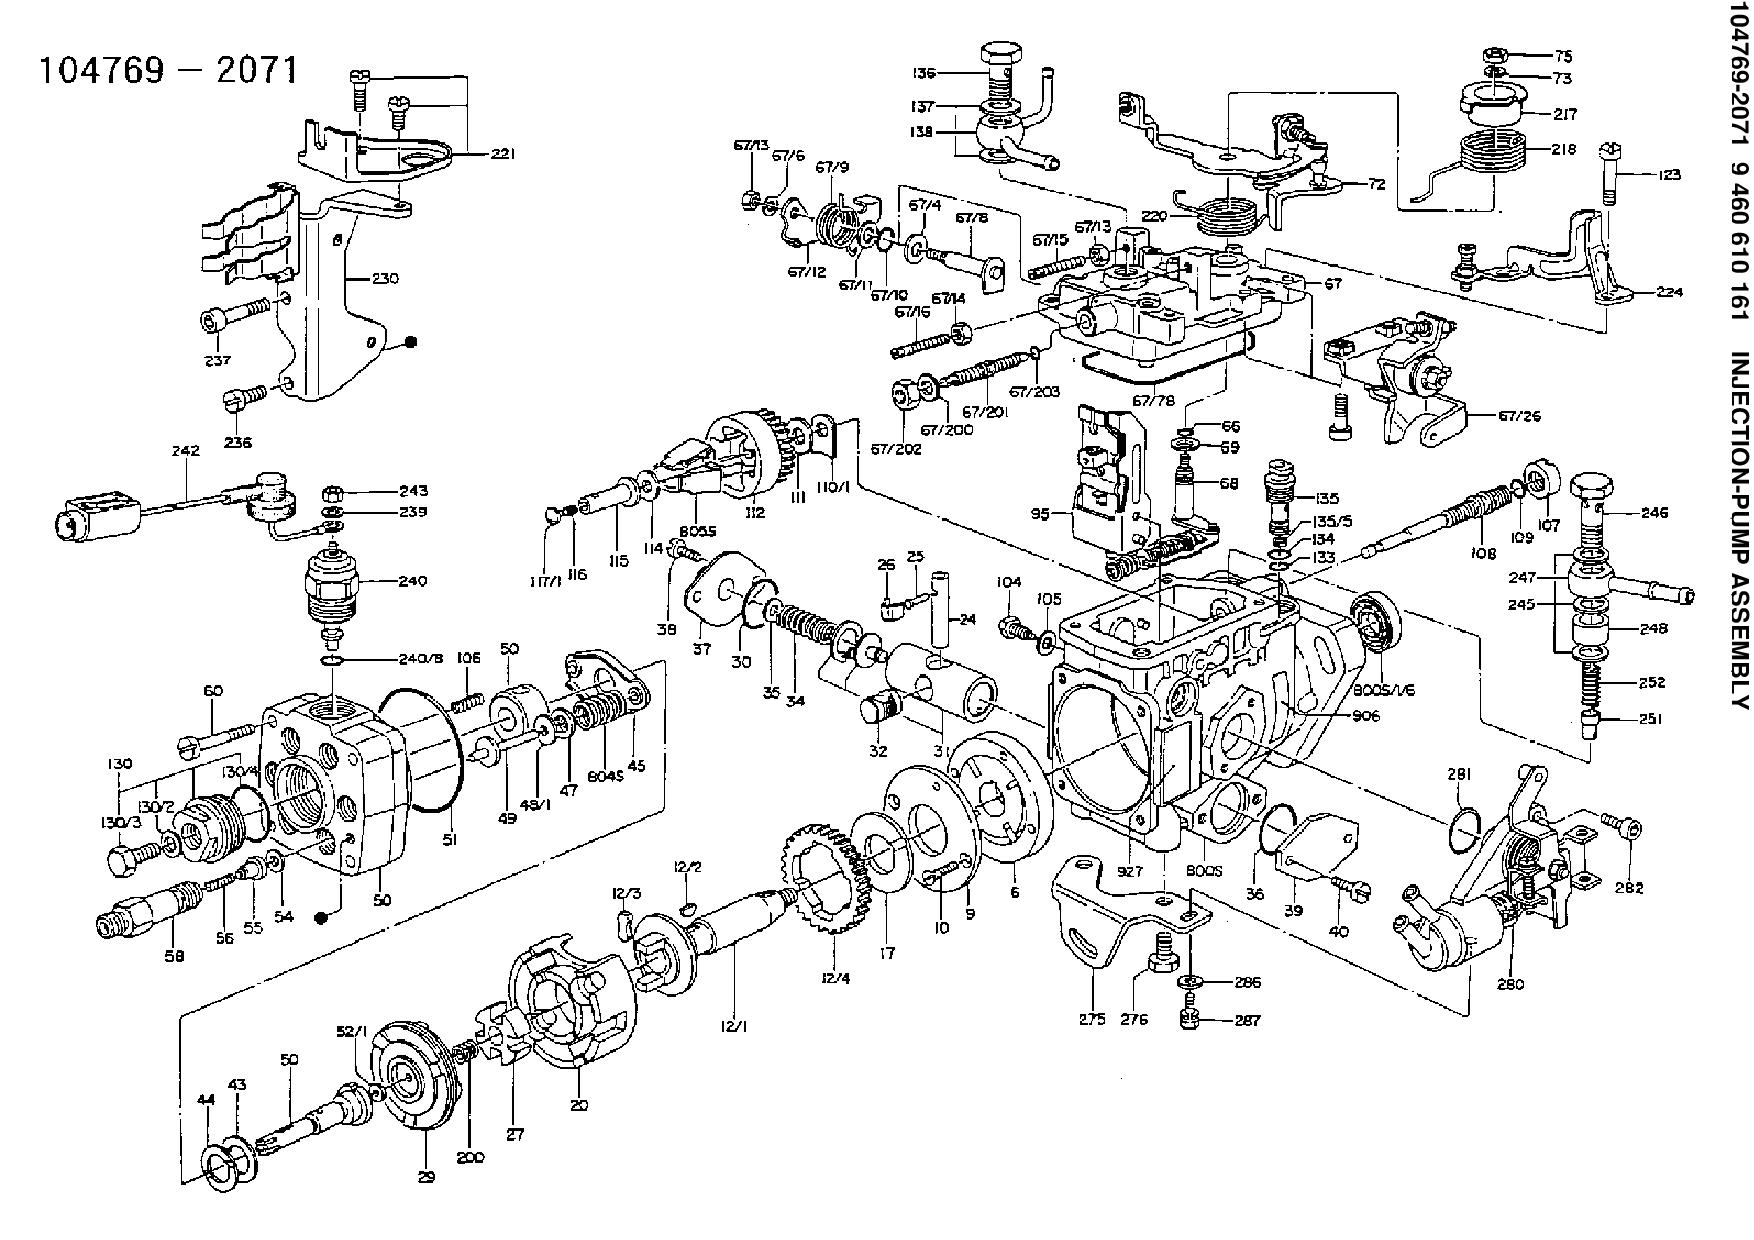 nv4500 wiring diagram kawasaki kfx450r engine part diagram